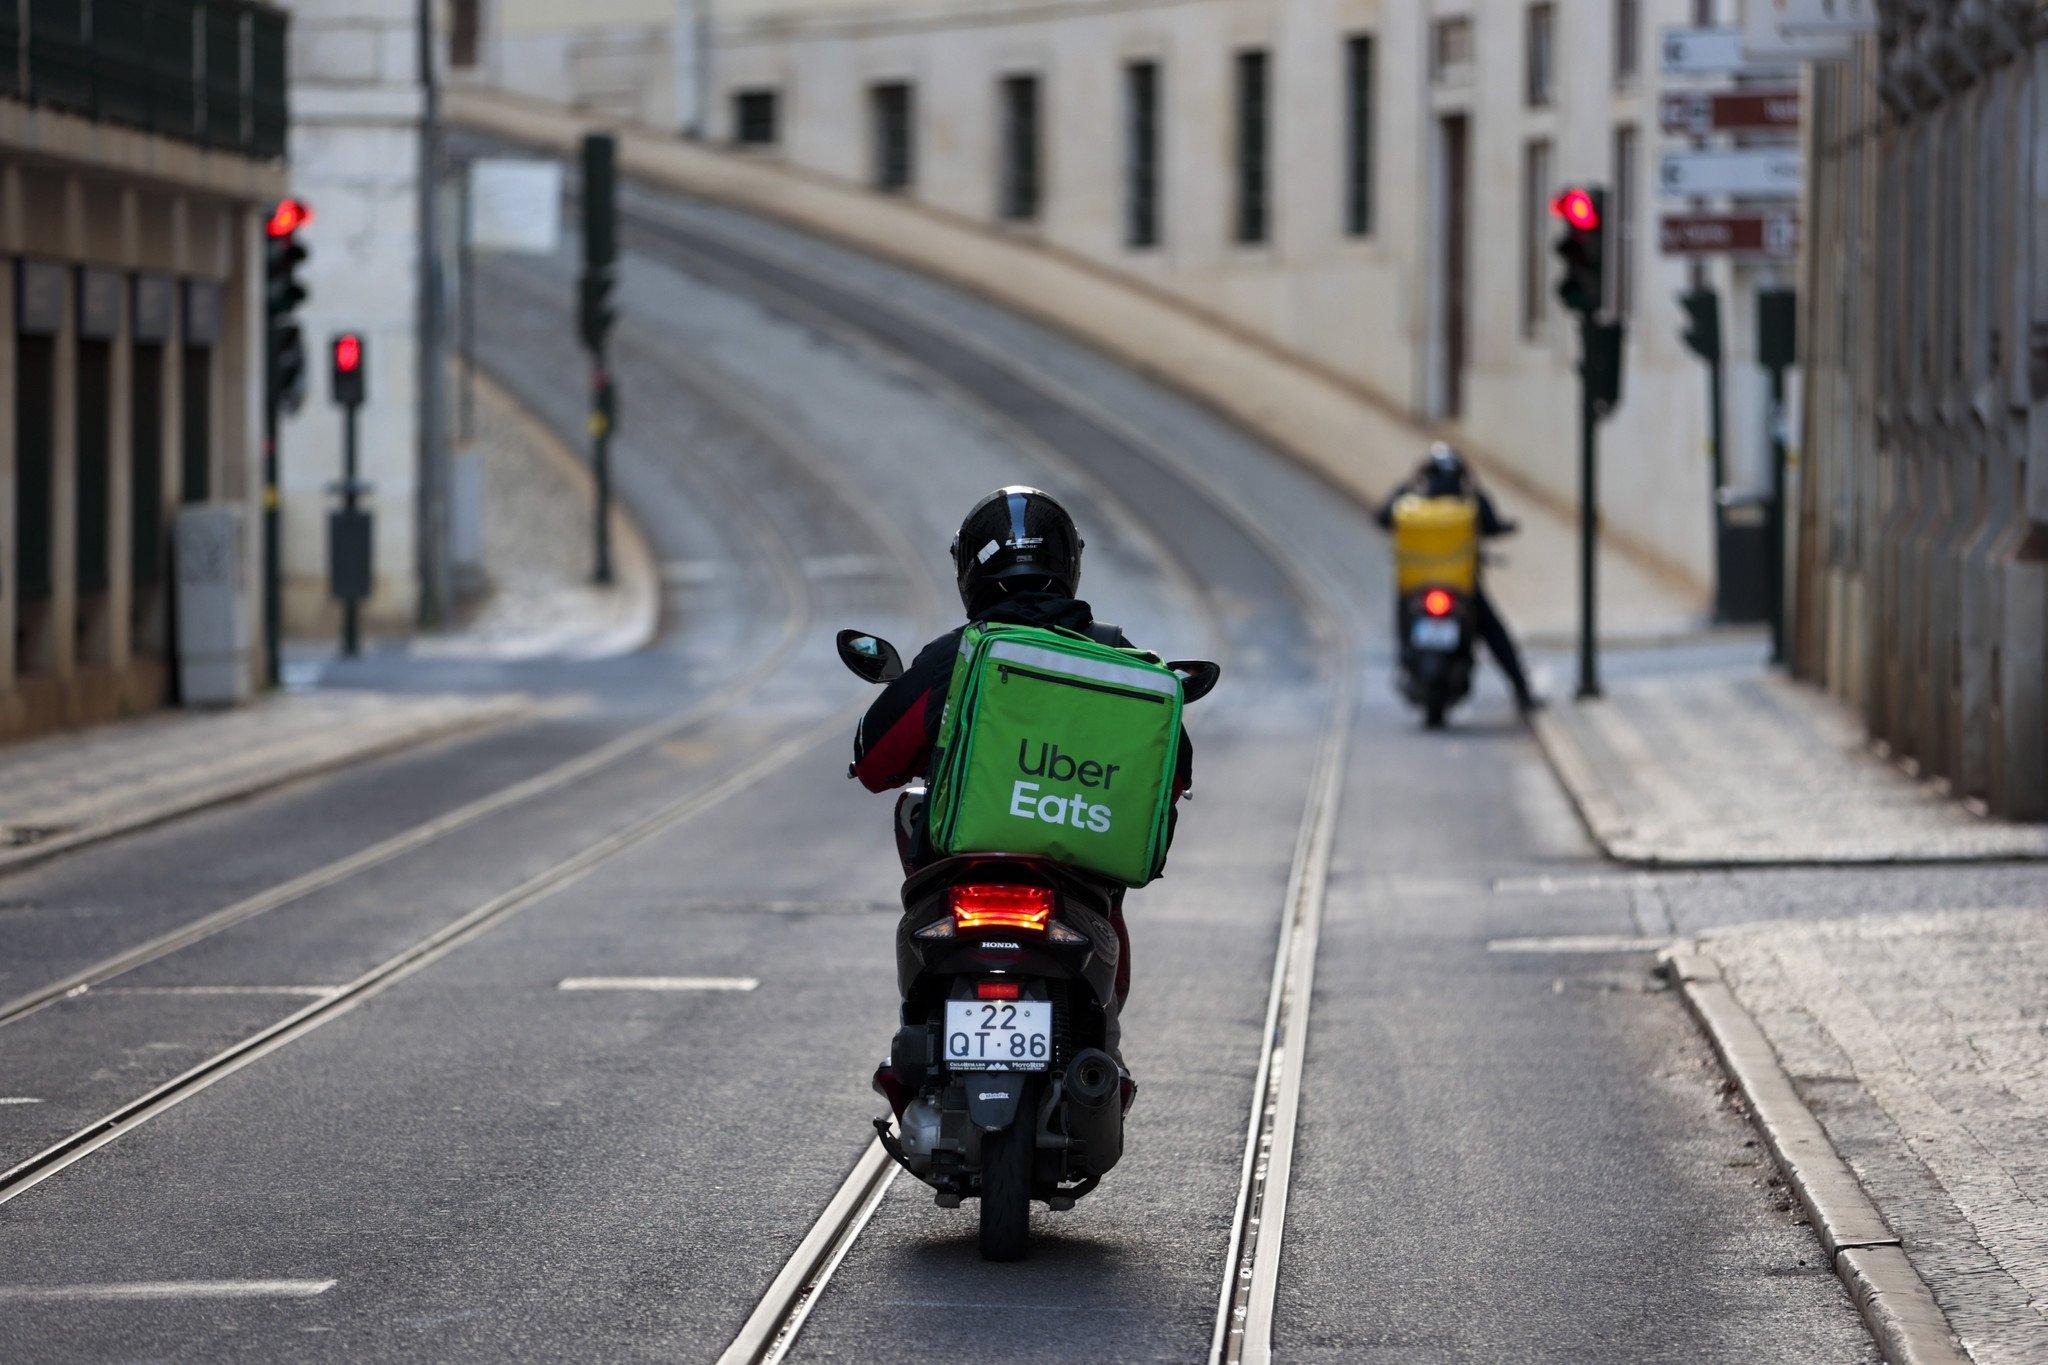 Uber Eats moto na estrada